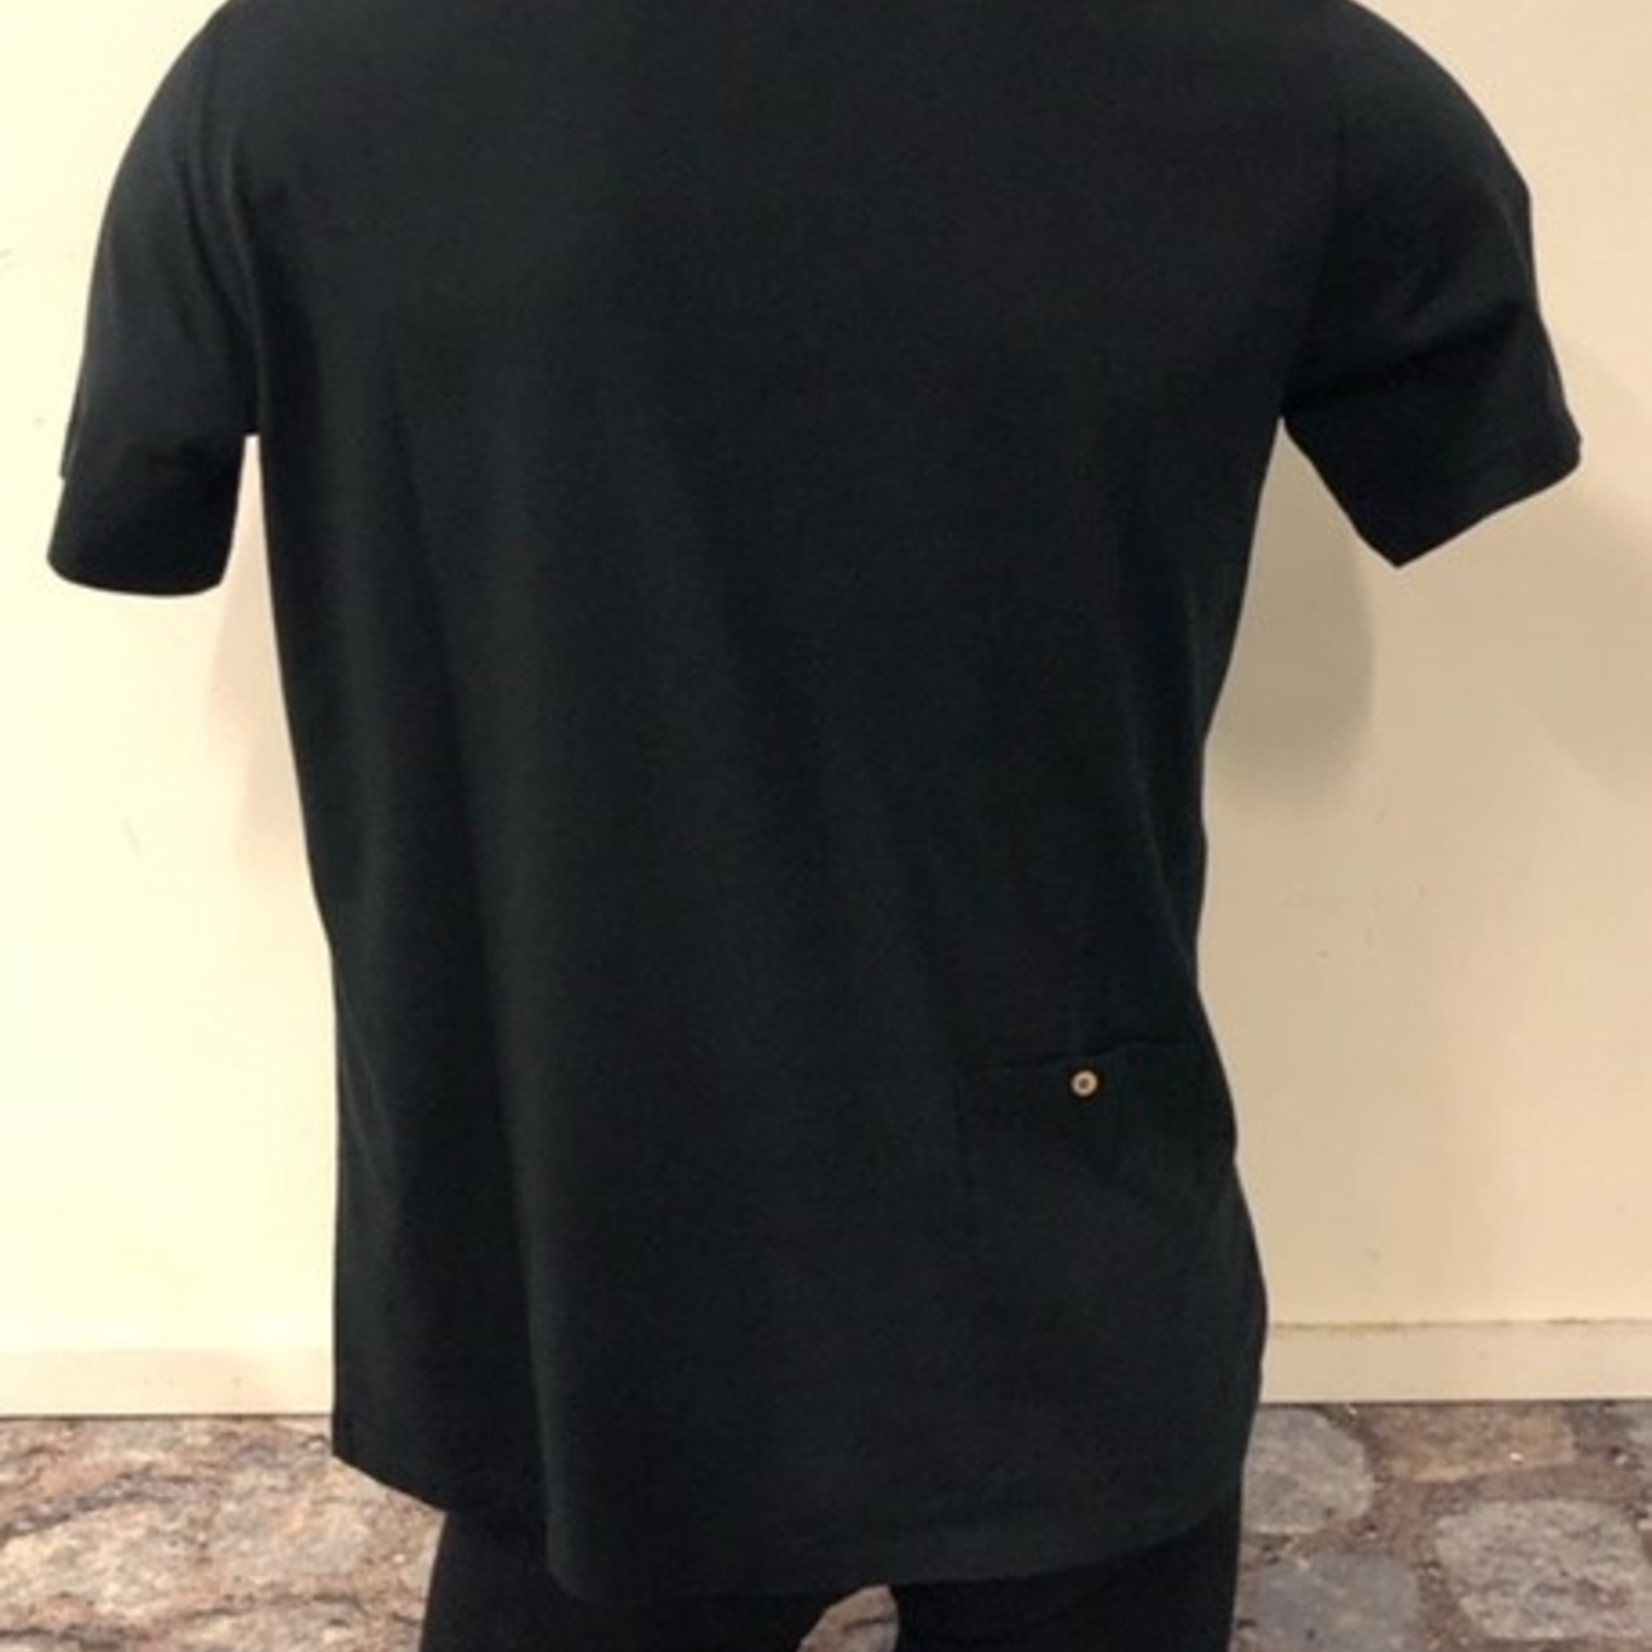 Polo 'Eddy' black